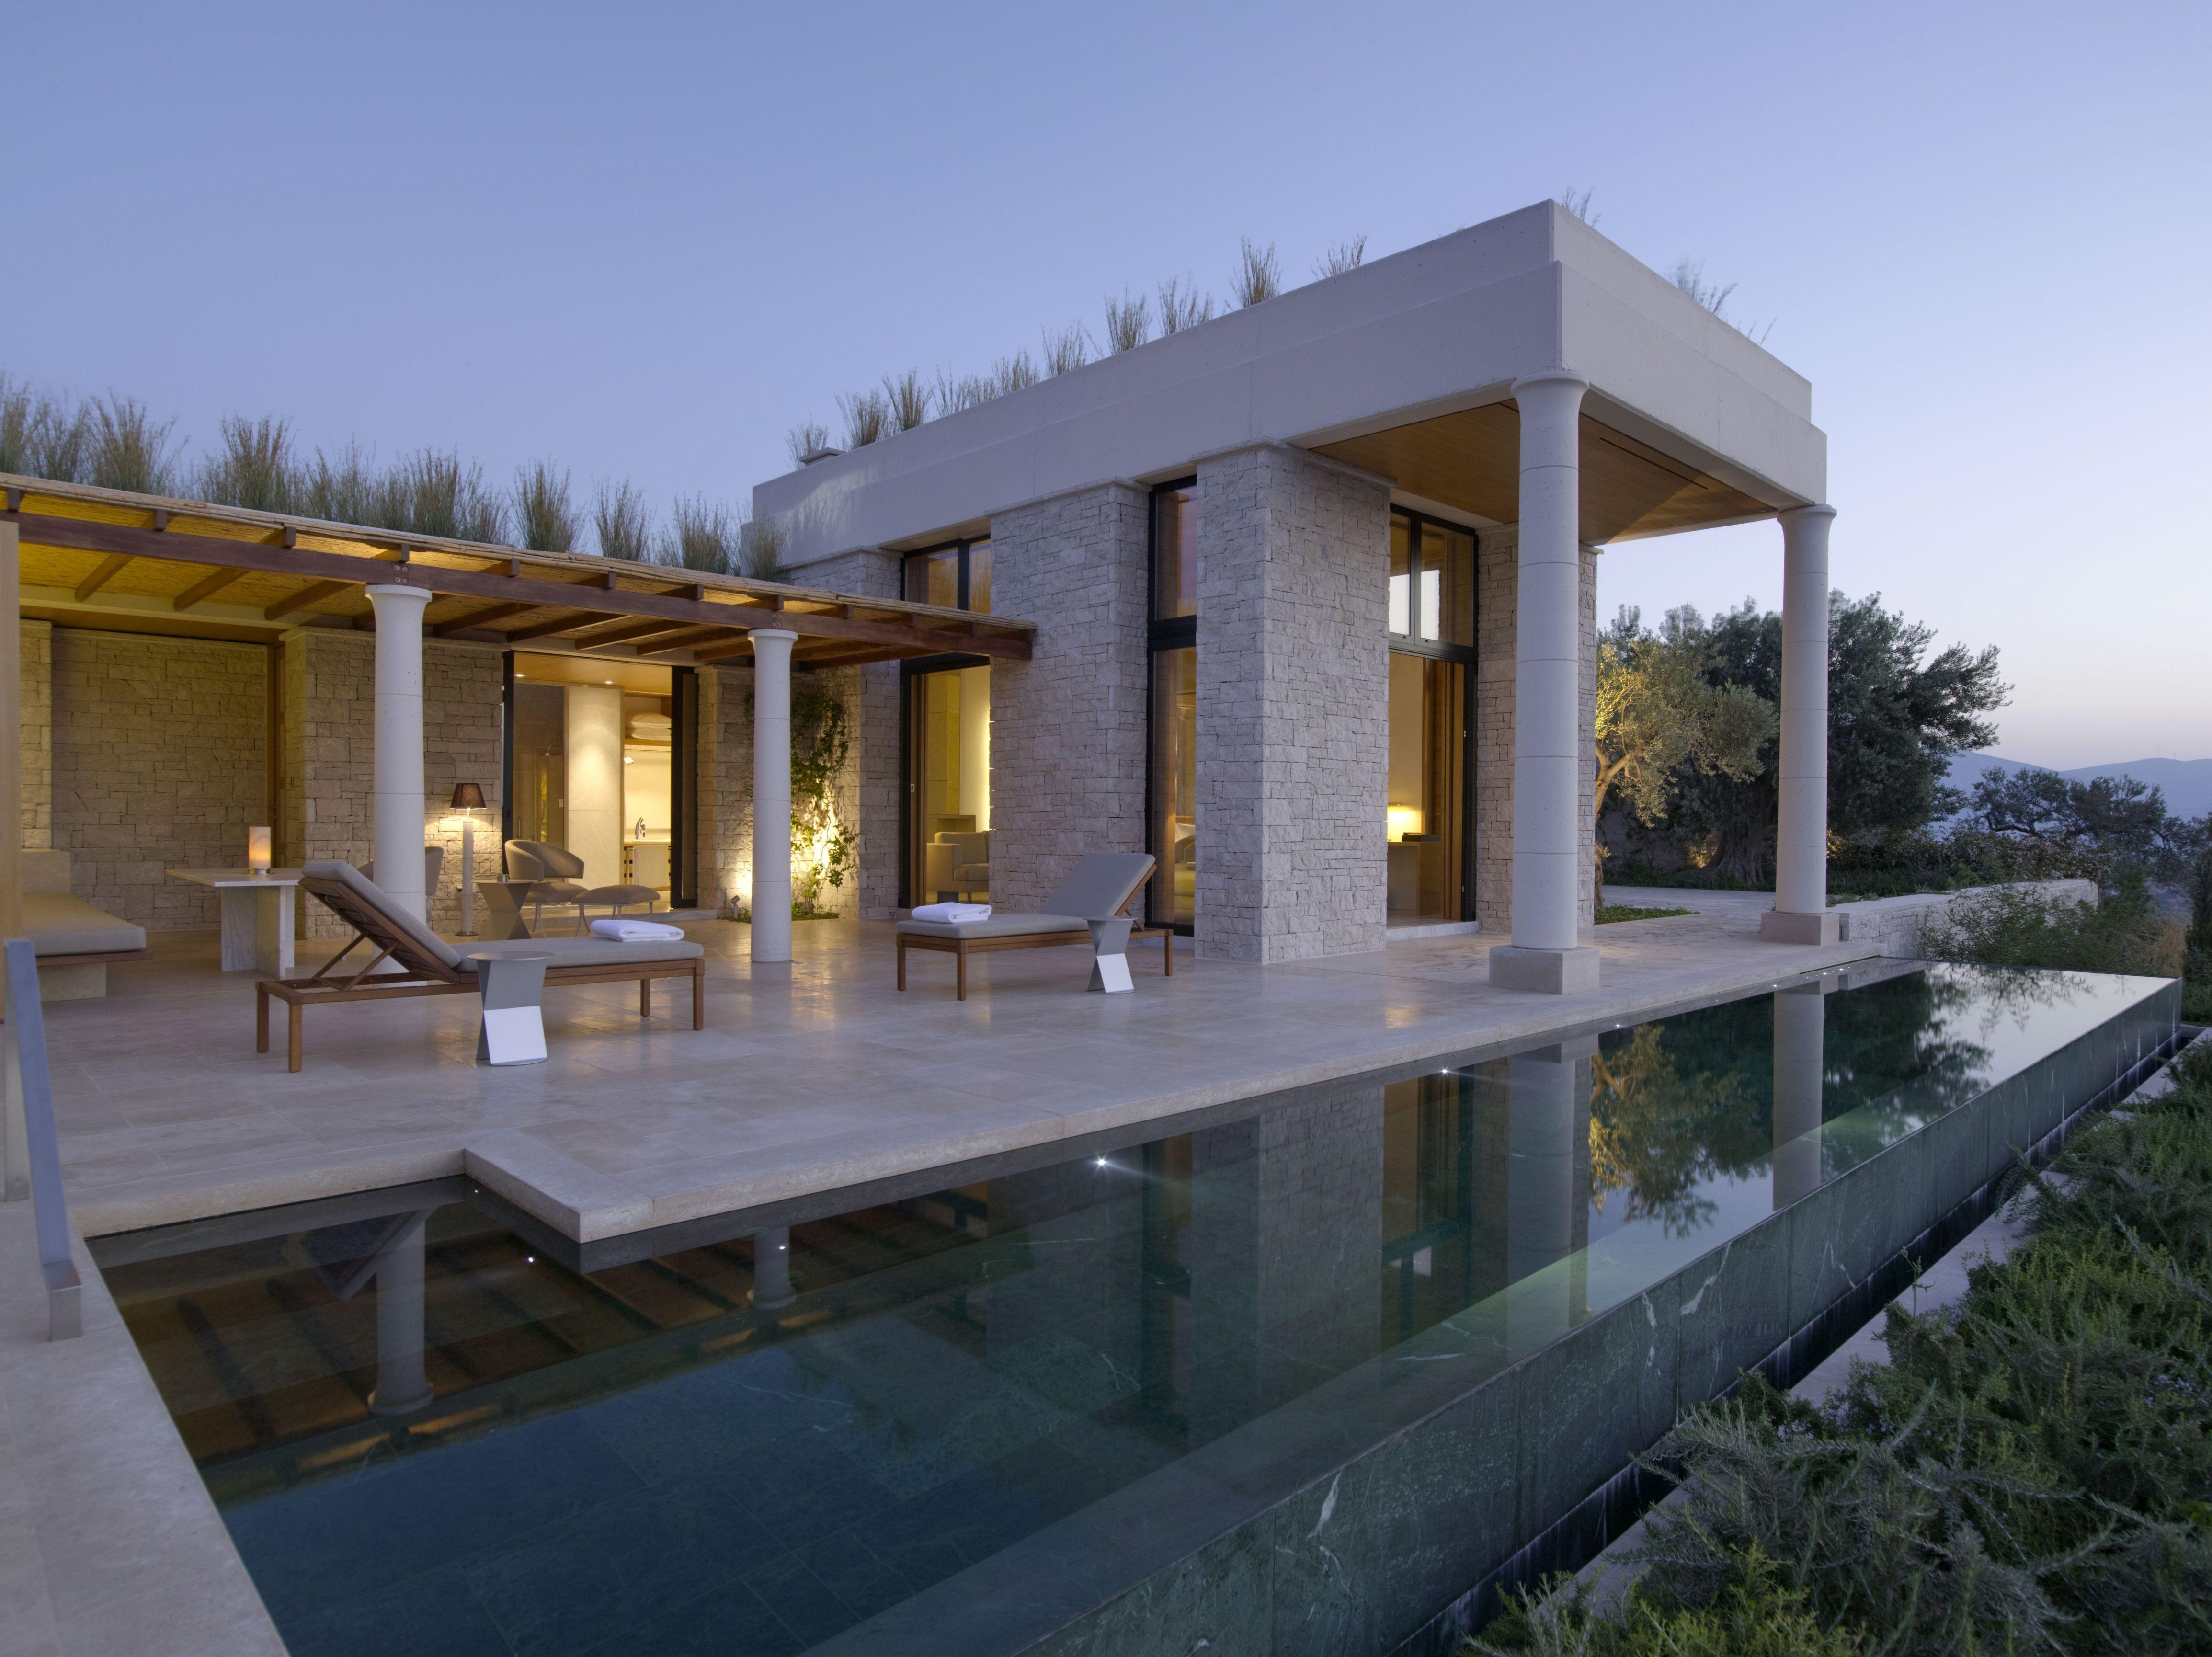 Peloponnese Luxury Hotels True Greece Presents The Amanzo E Resort Hotel In Porto Heli Pelopponese